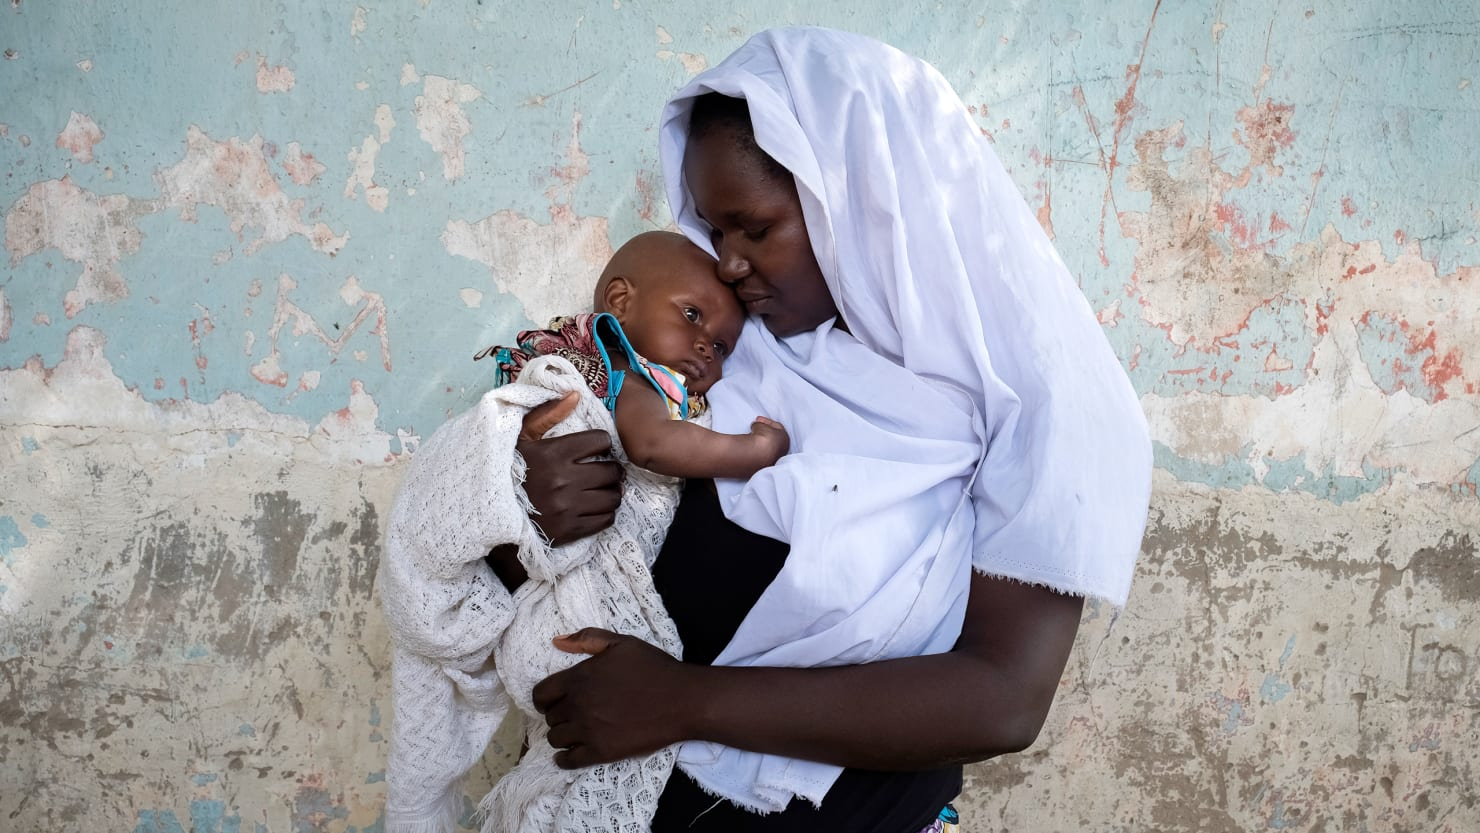 boko haram brides and their babies